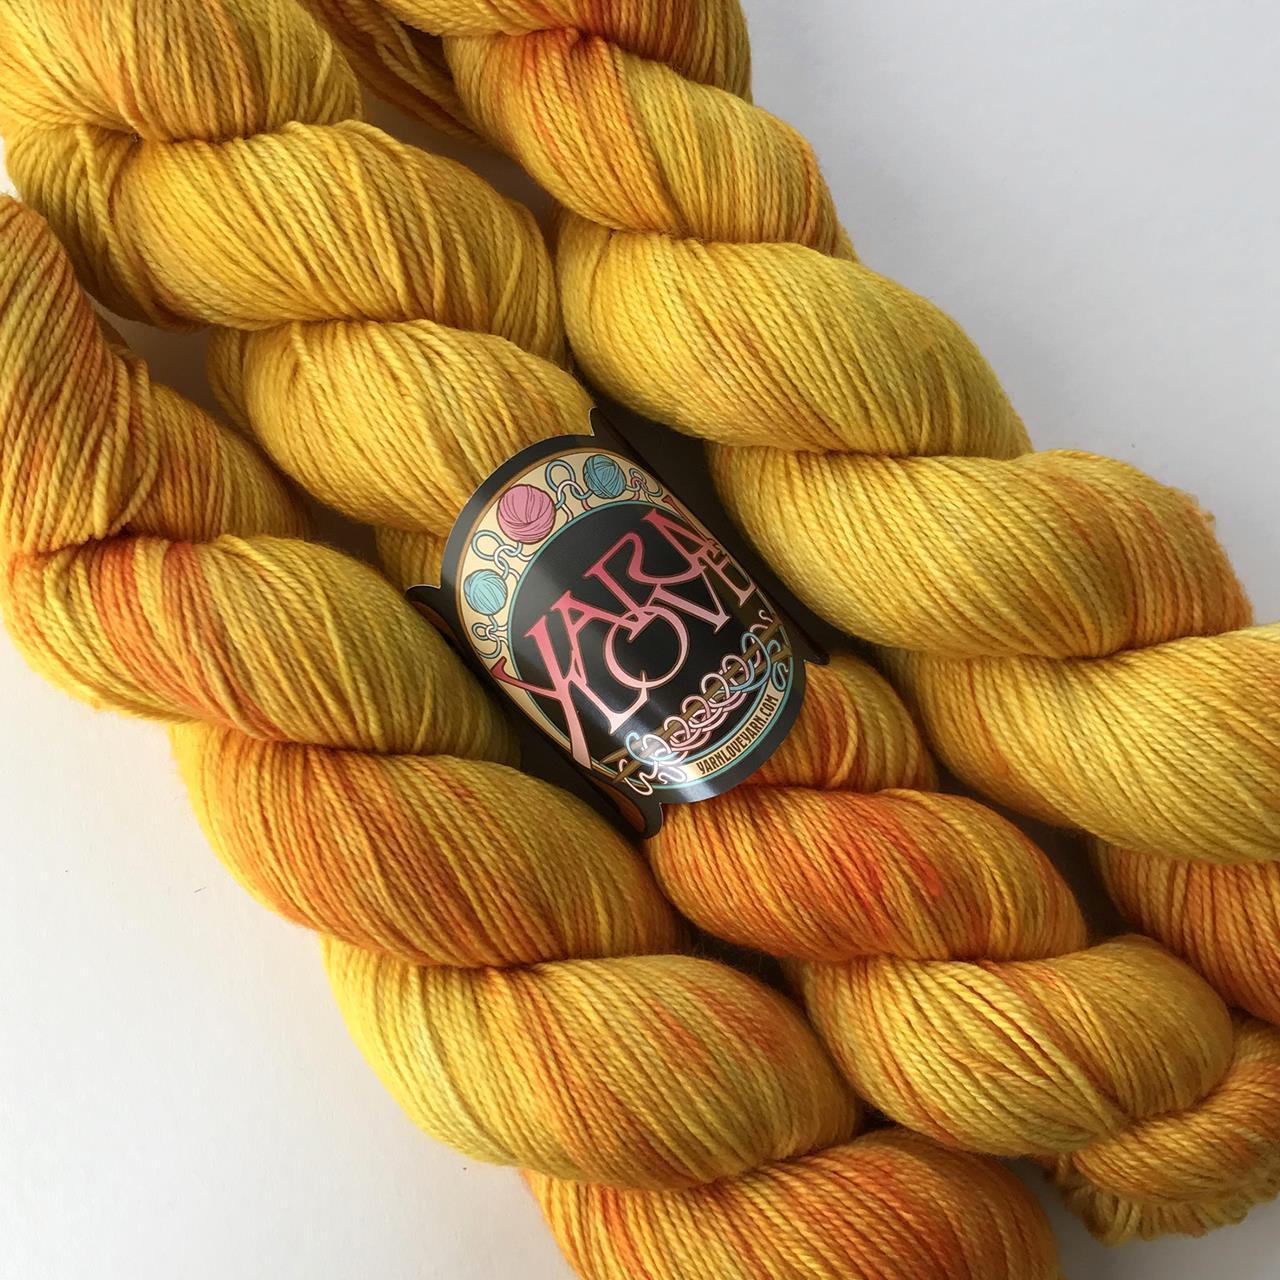 YL Goldilocks Saffron -